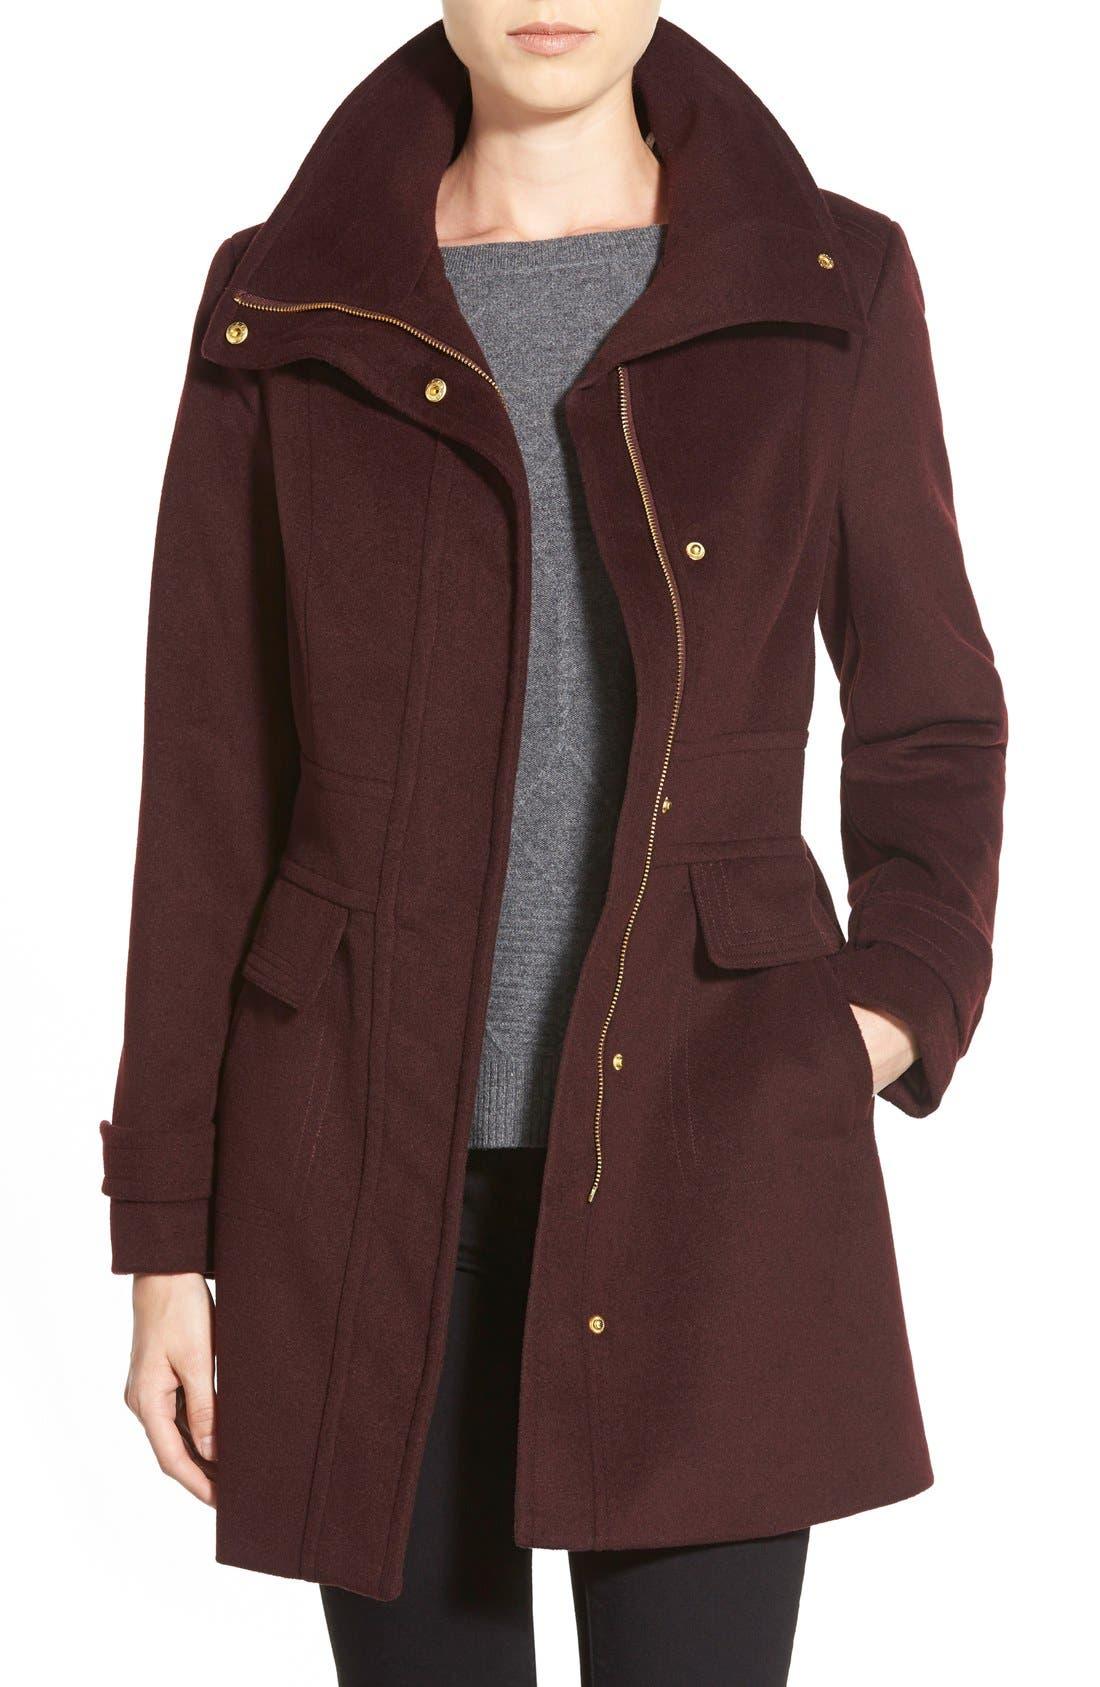 Cole HaanSignature Stand Collar Wool Blend Coat,                         Main,                         color, Bordeaux